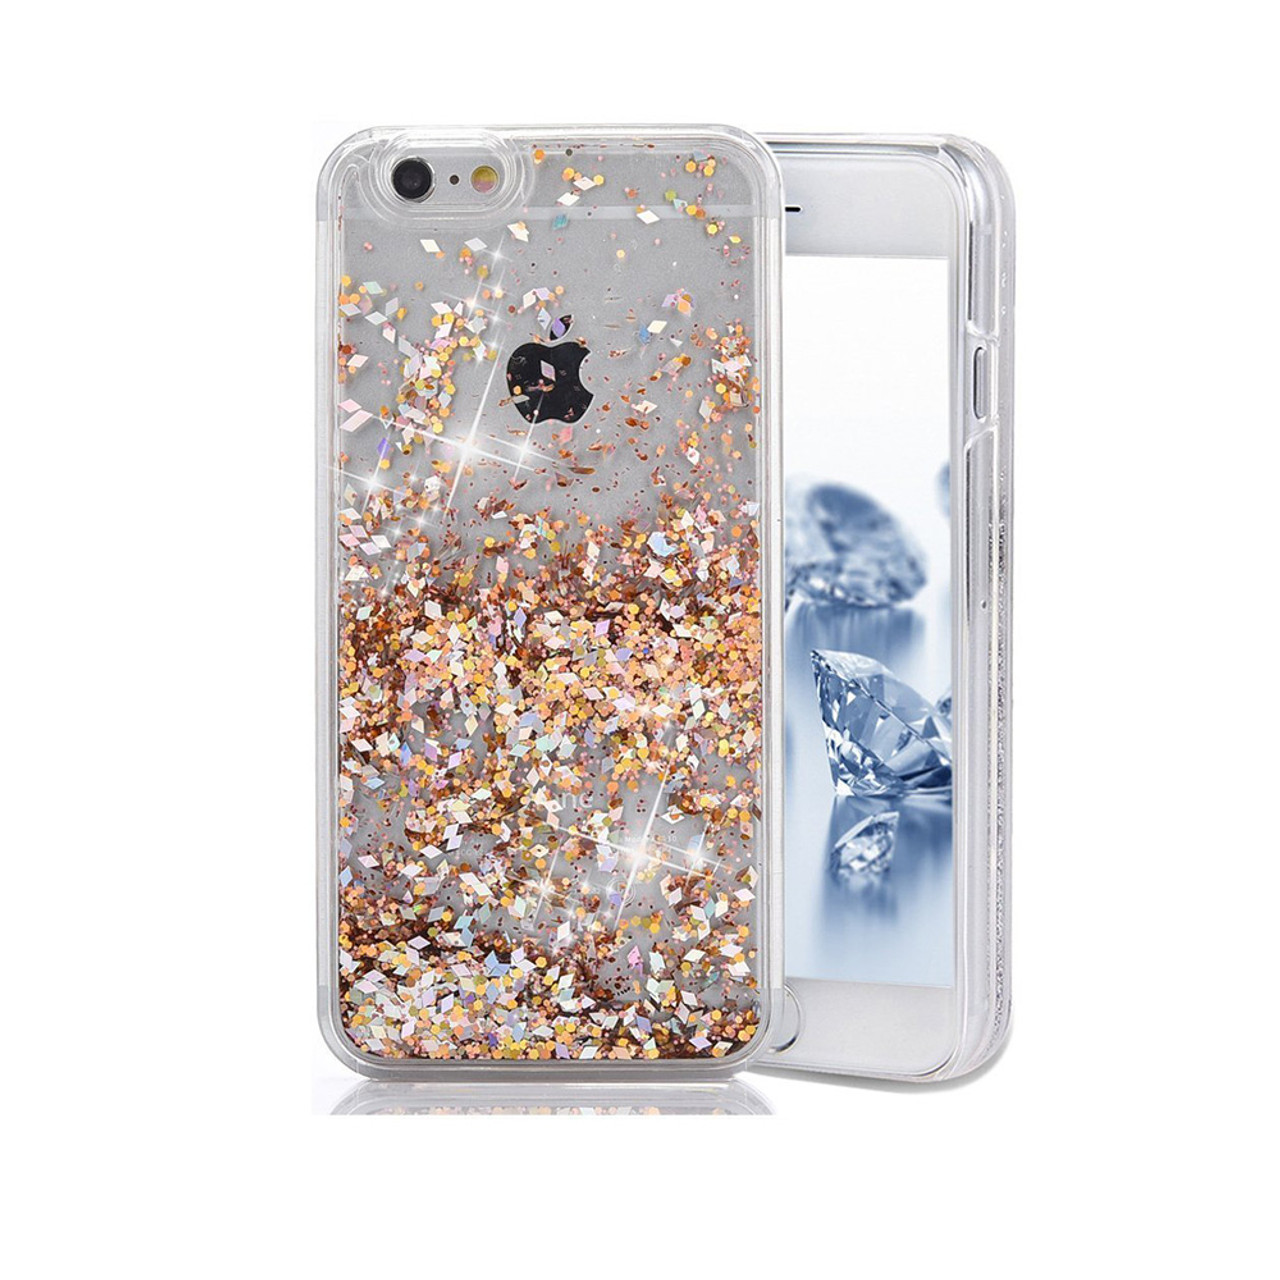 b5ecf16714a7 Liquid Glitter TPU Case for Samsung Galaxy S7 Edge Gold - eWirelessUSA